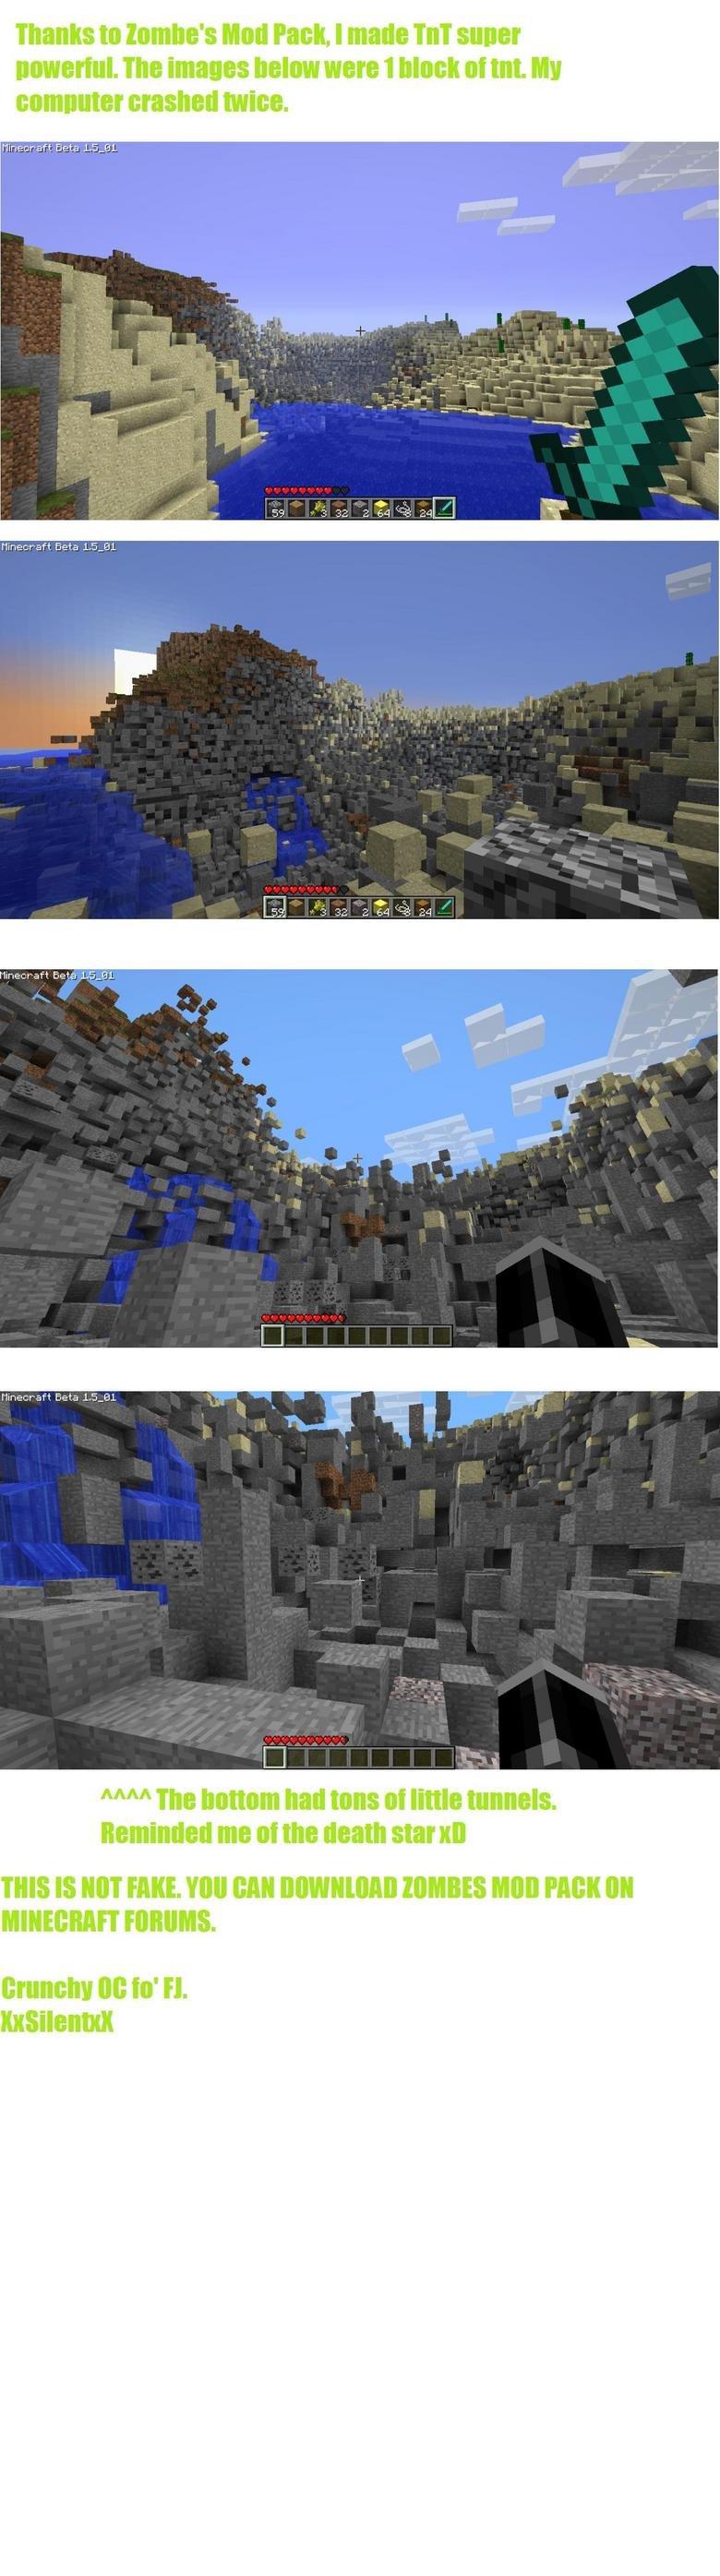 "Minecraft Explosian.. Worth the crash? erm.... mums in Z[ ':' S Mm! Pack"" I mails Mt; gamer t: mai: masaomi MIM, rockit Ema Lam The lemmon had Emu IT, Imus . mm Minecraft"